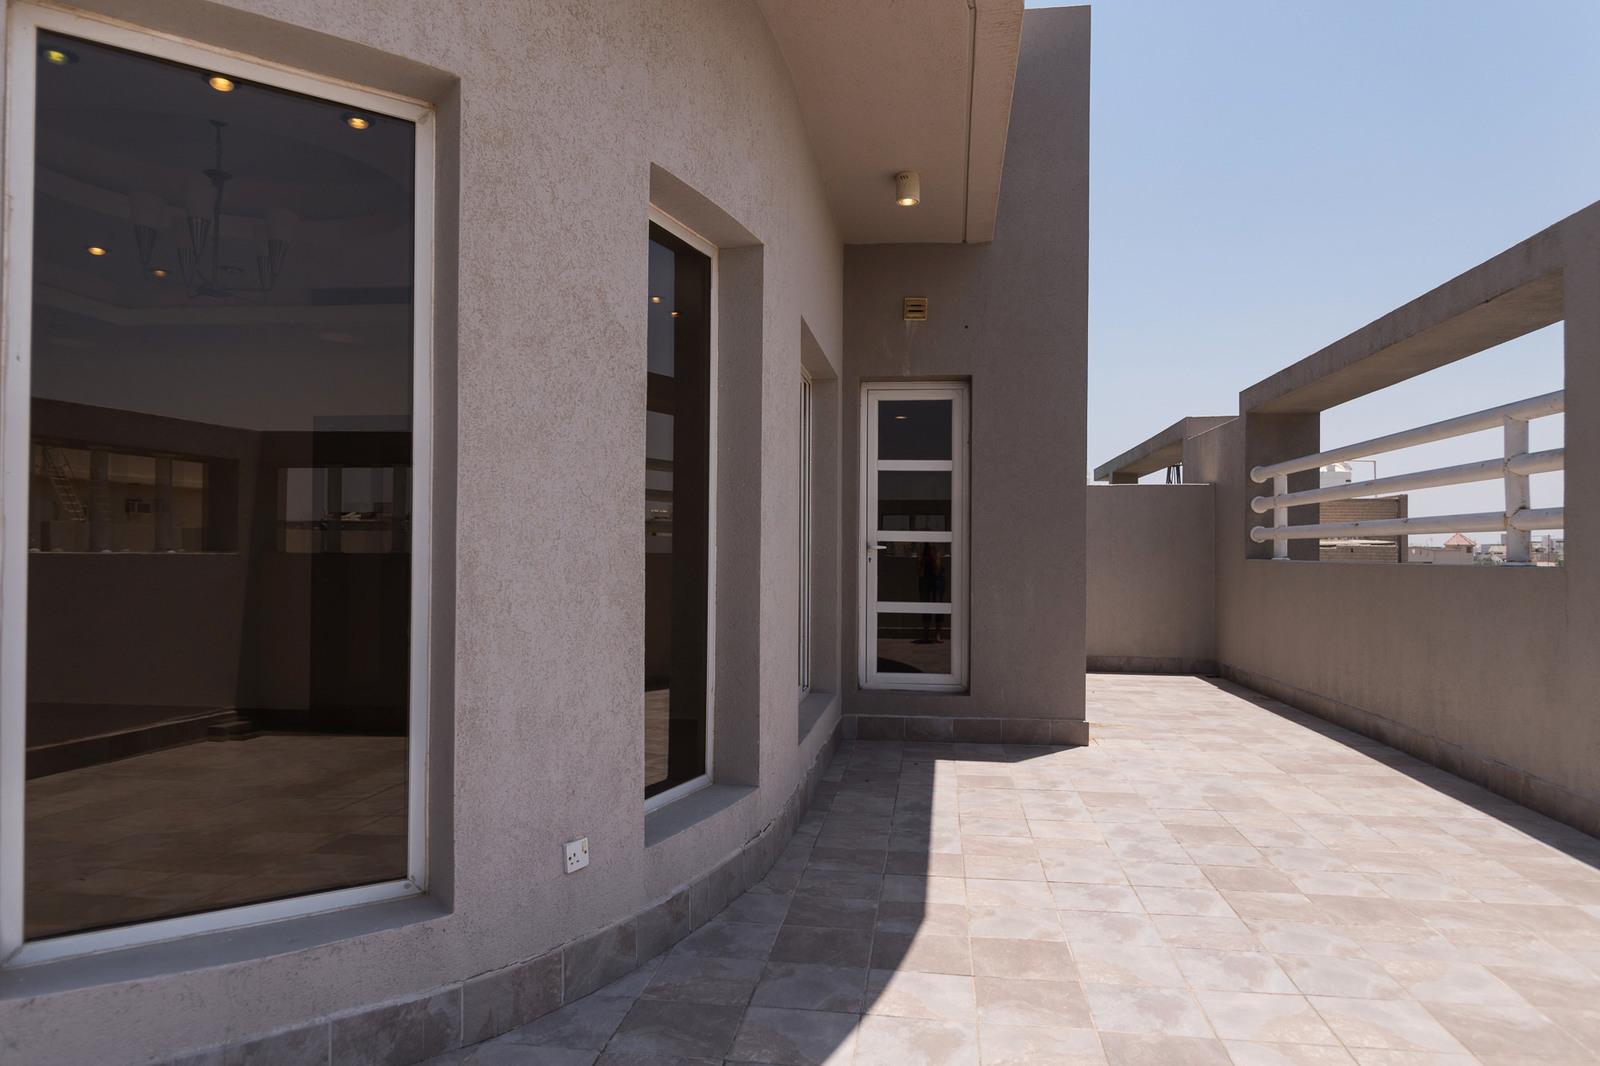 Rumathiya – great, unfurnished, three bedroom apartment w/large terrace